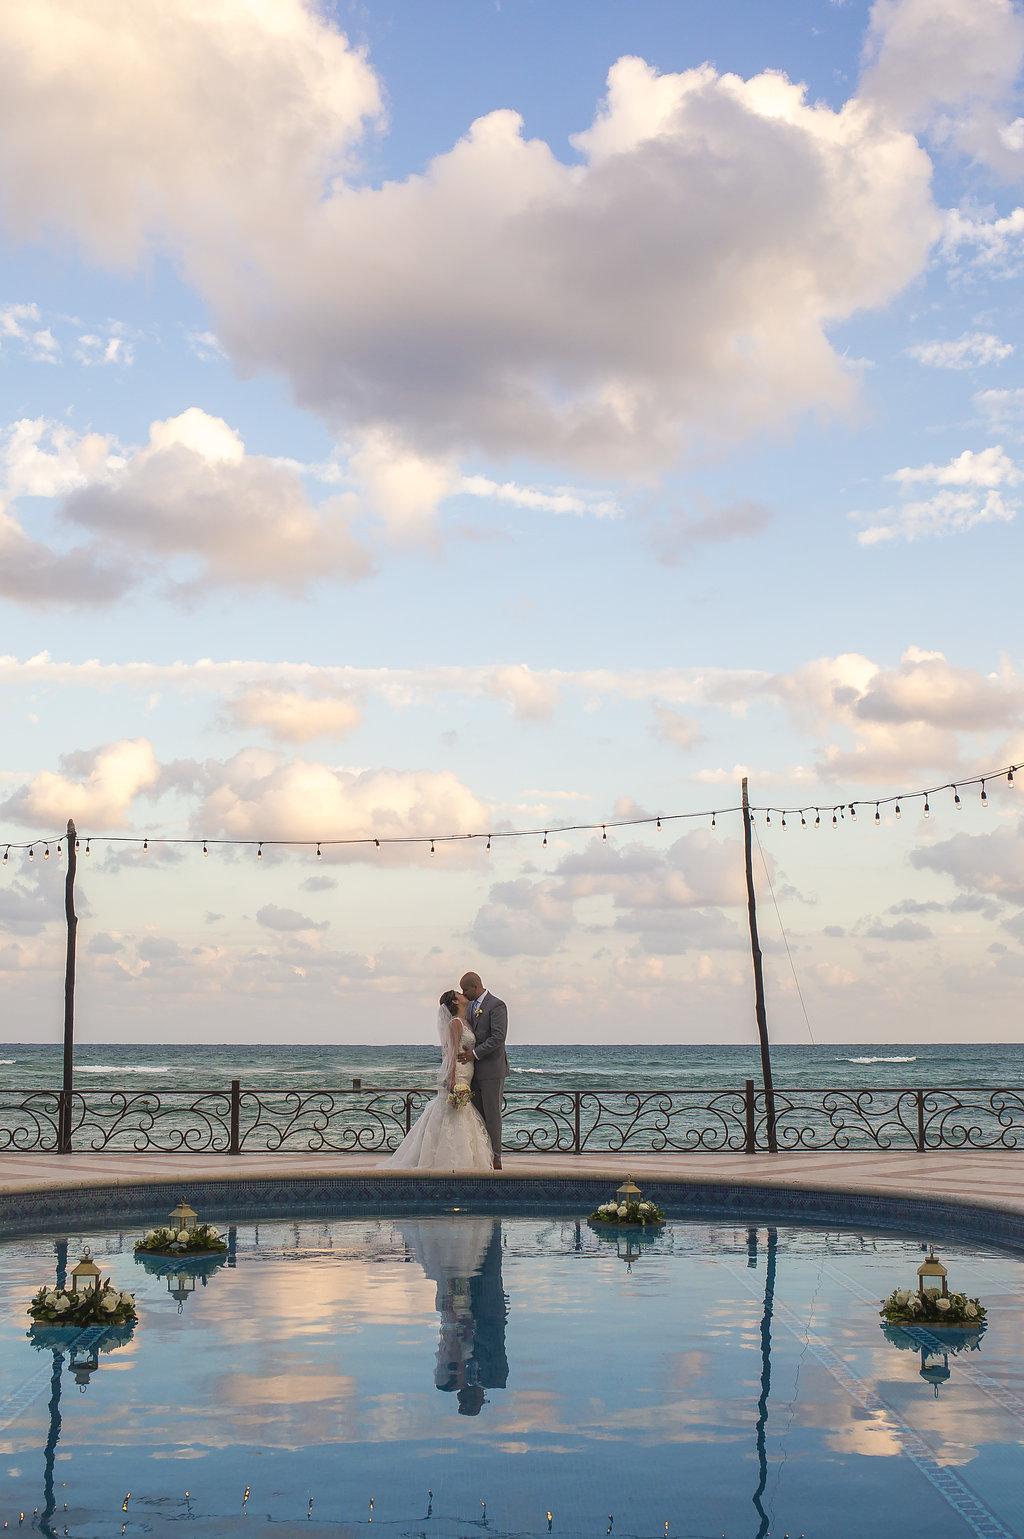 yesica-jose-beach-wedding-Villa-La-Joya--Playa-del-carmen-01--33.jpg